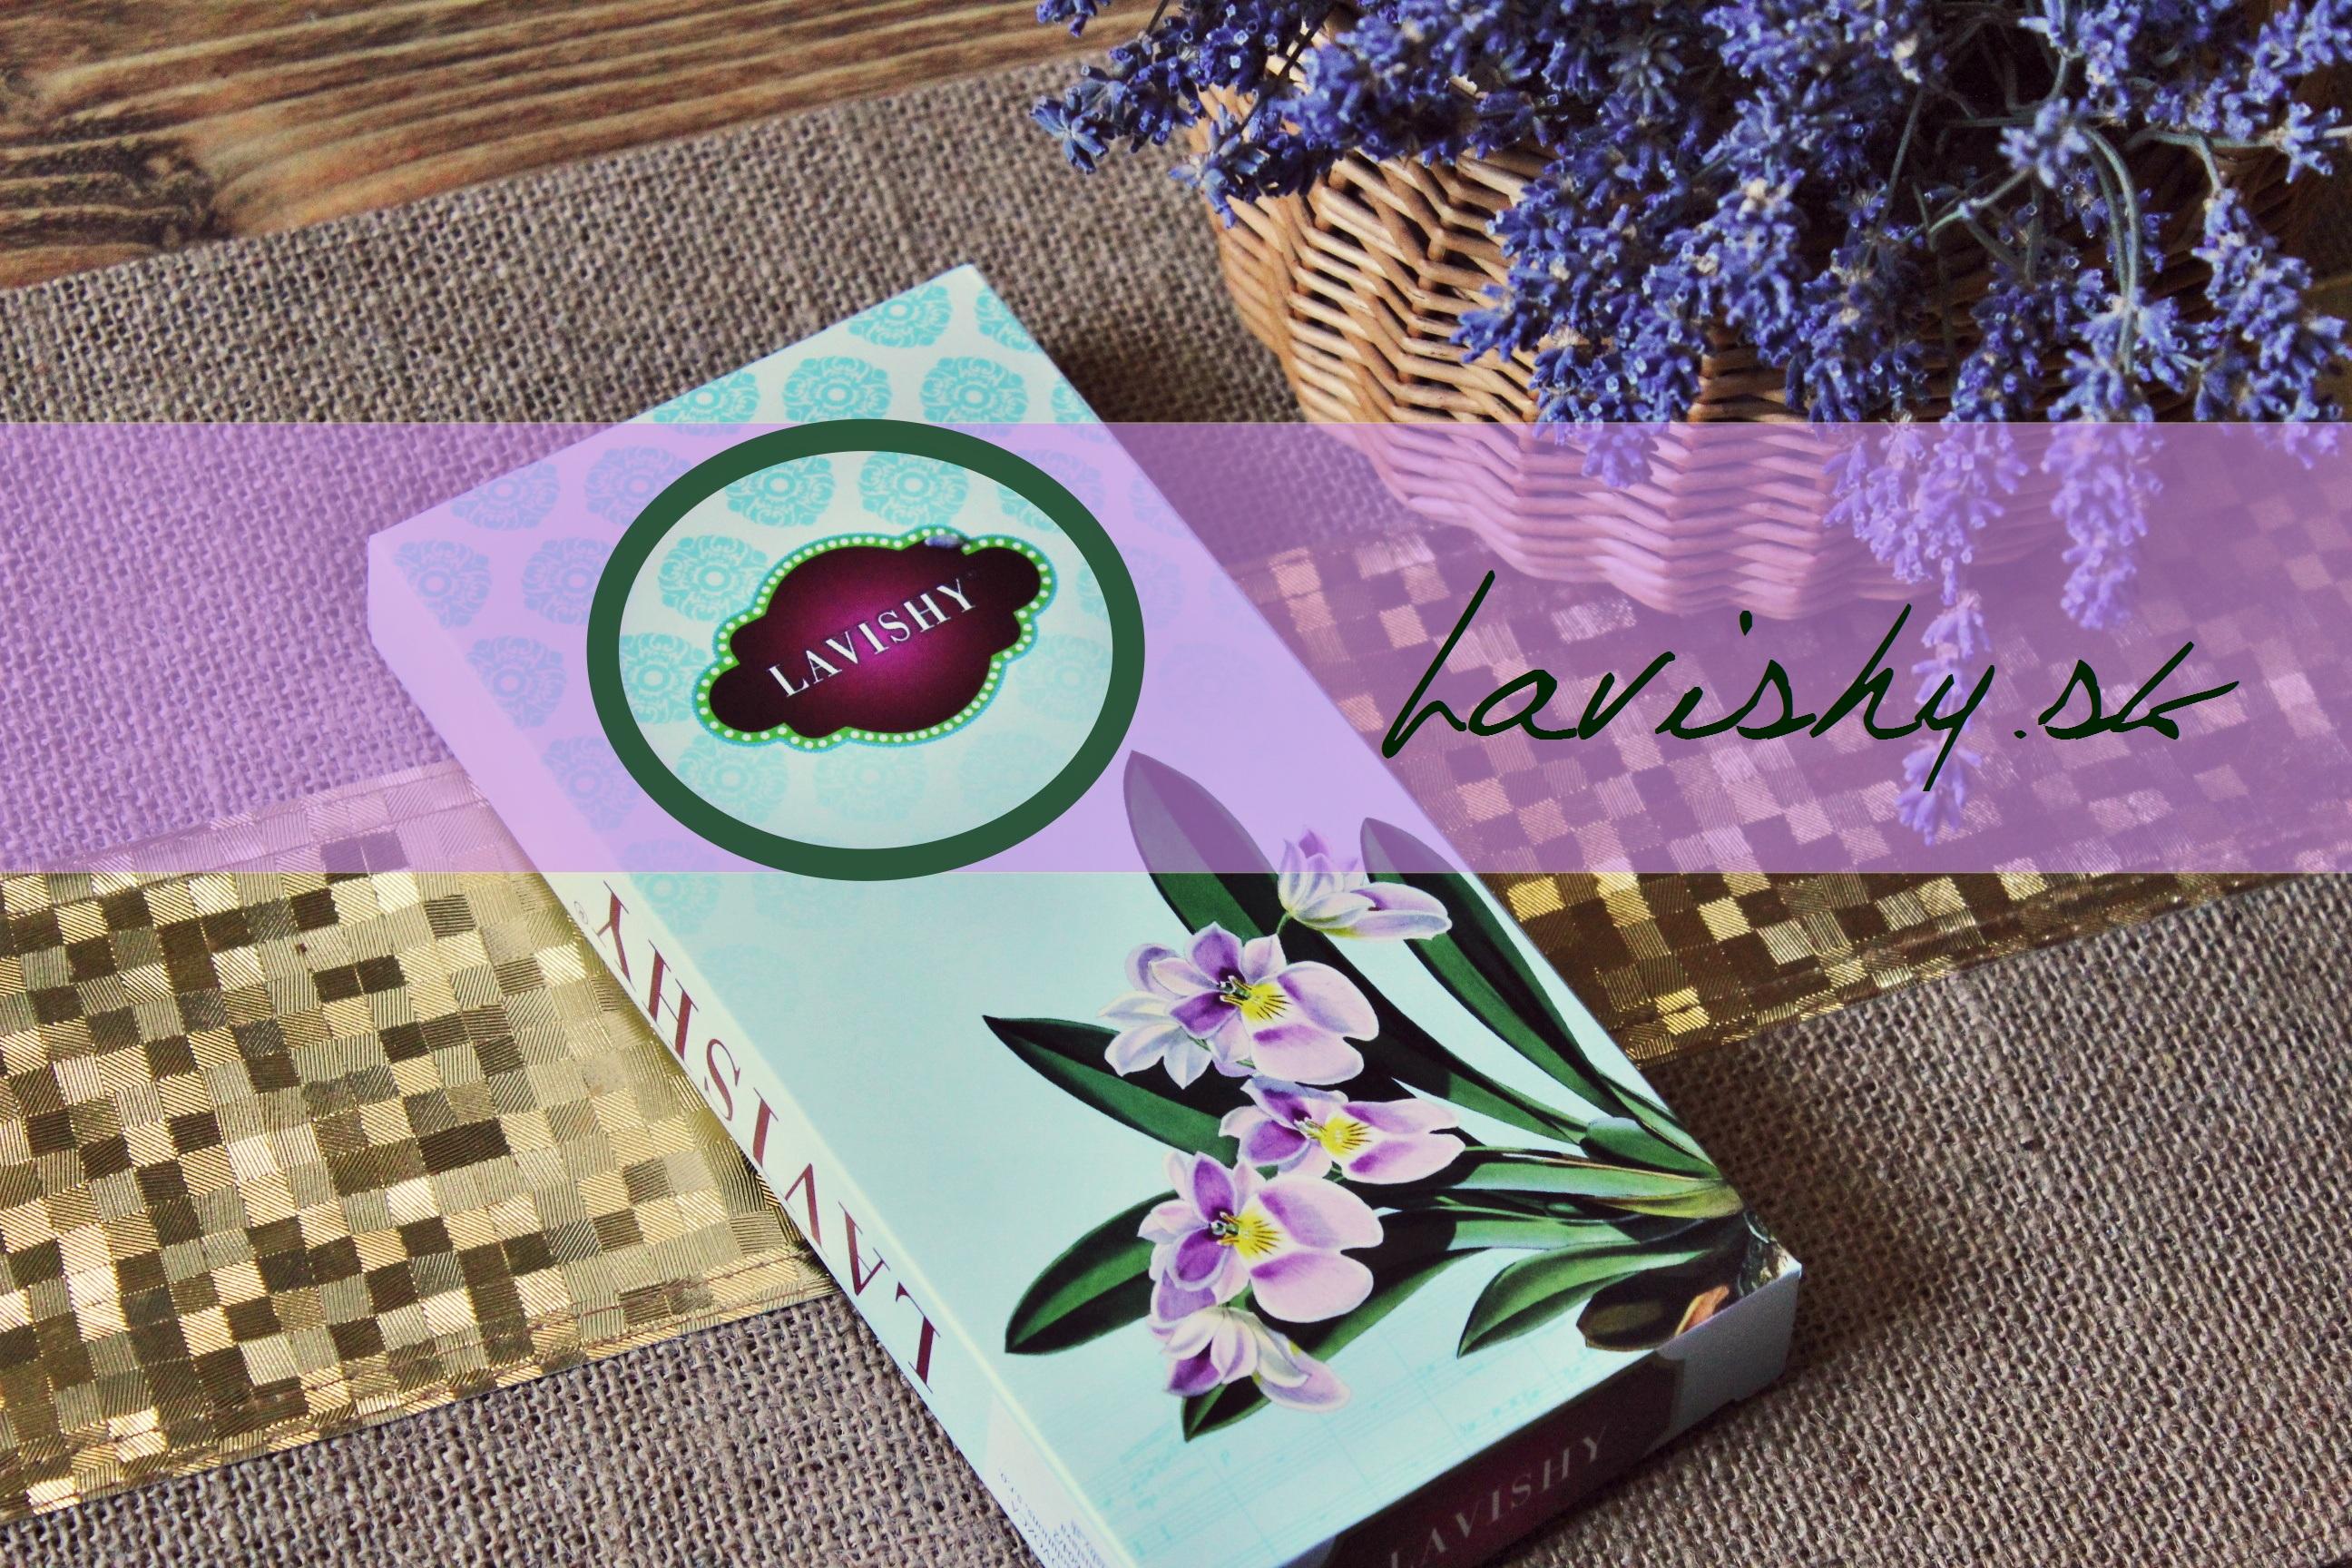 www.lavishy.sk